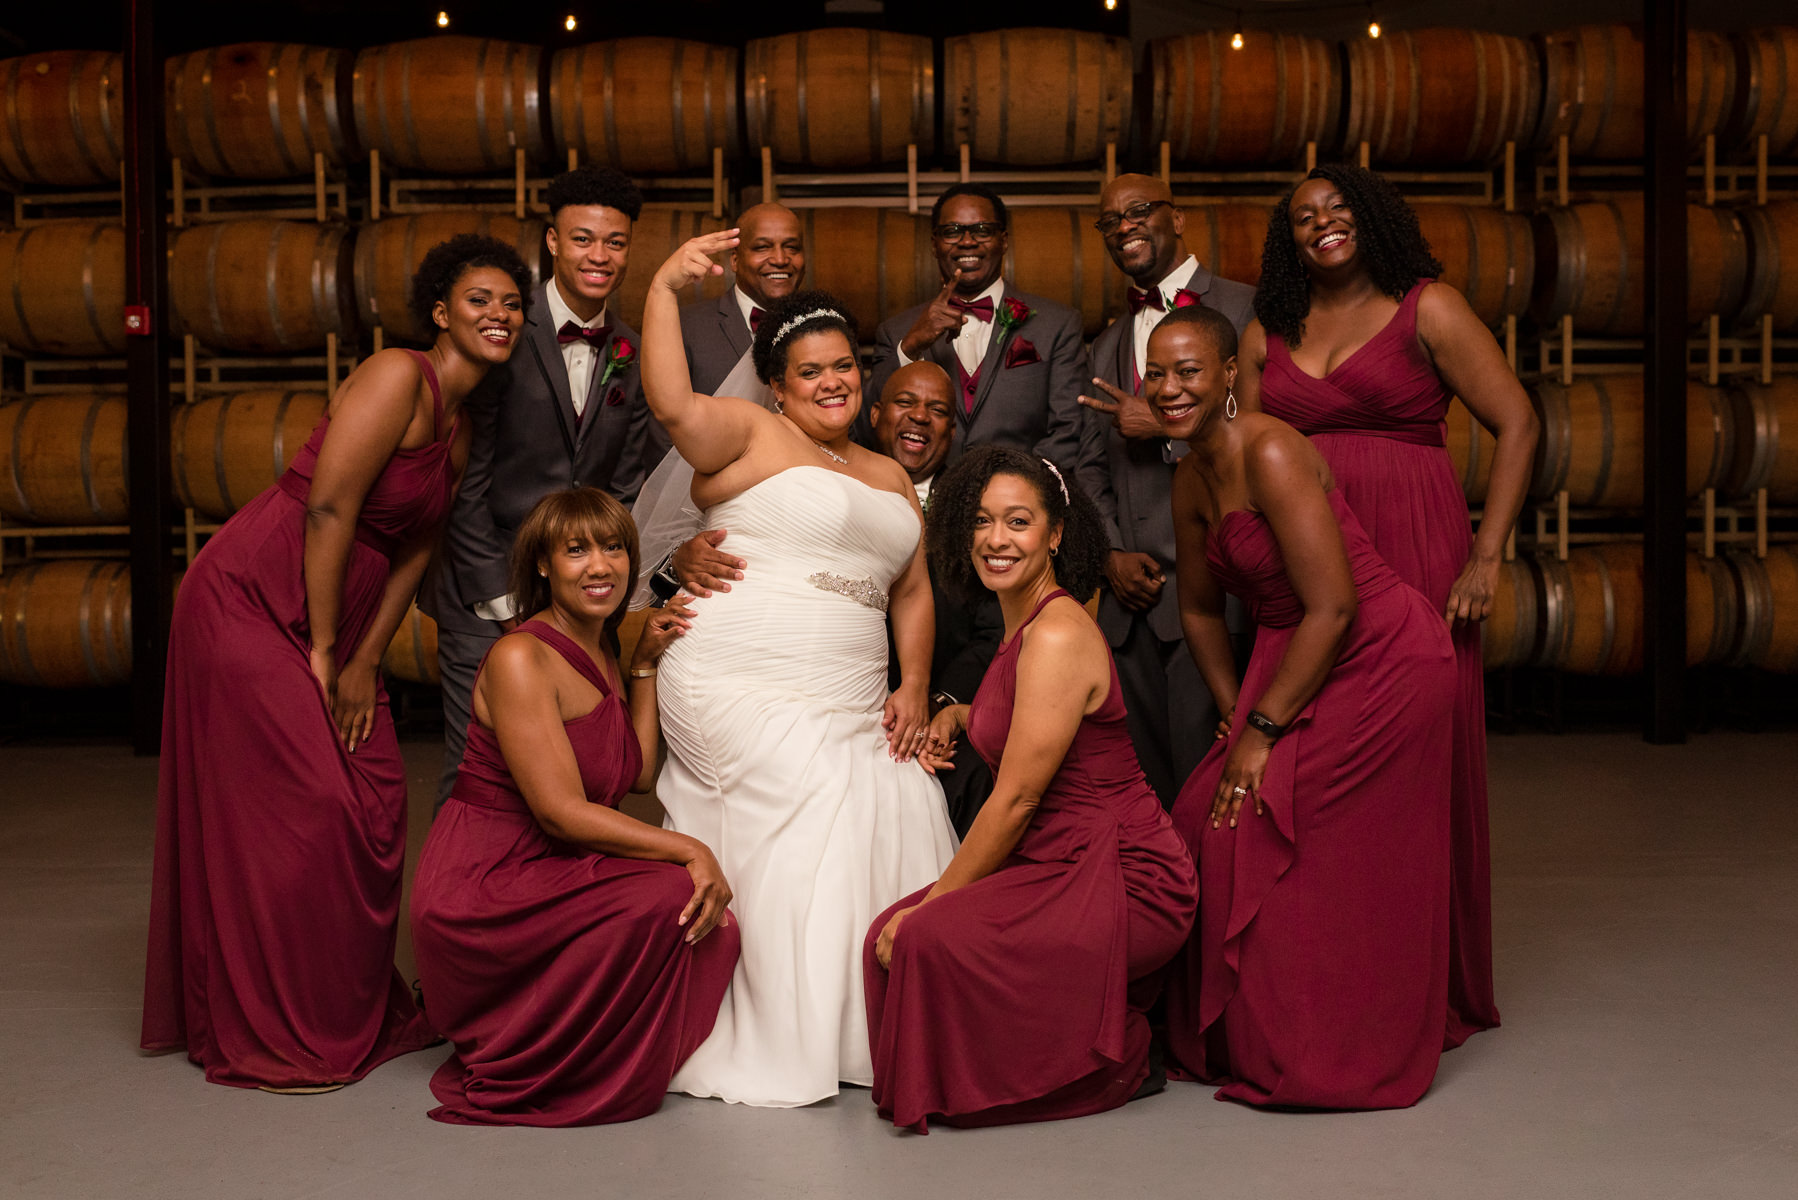 Andrew Tat - Documentary Wedding Photography - Columbia Winery - Woodinville, Washington -Patricia & Teffin - 07.jpg